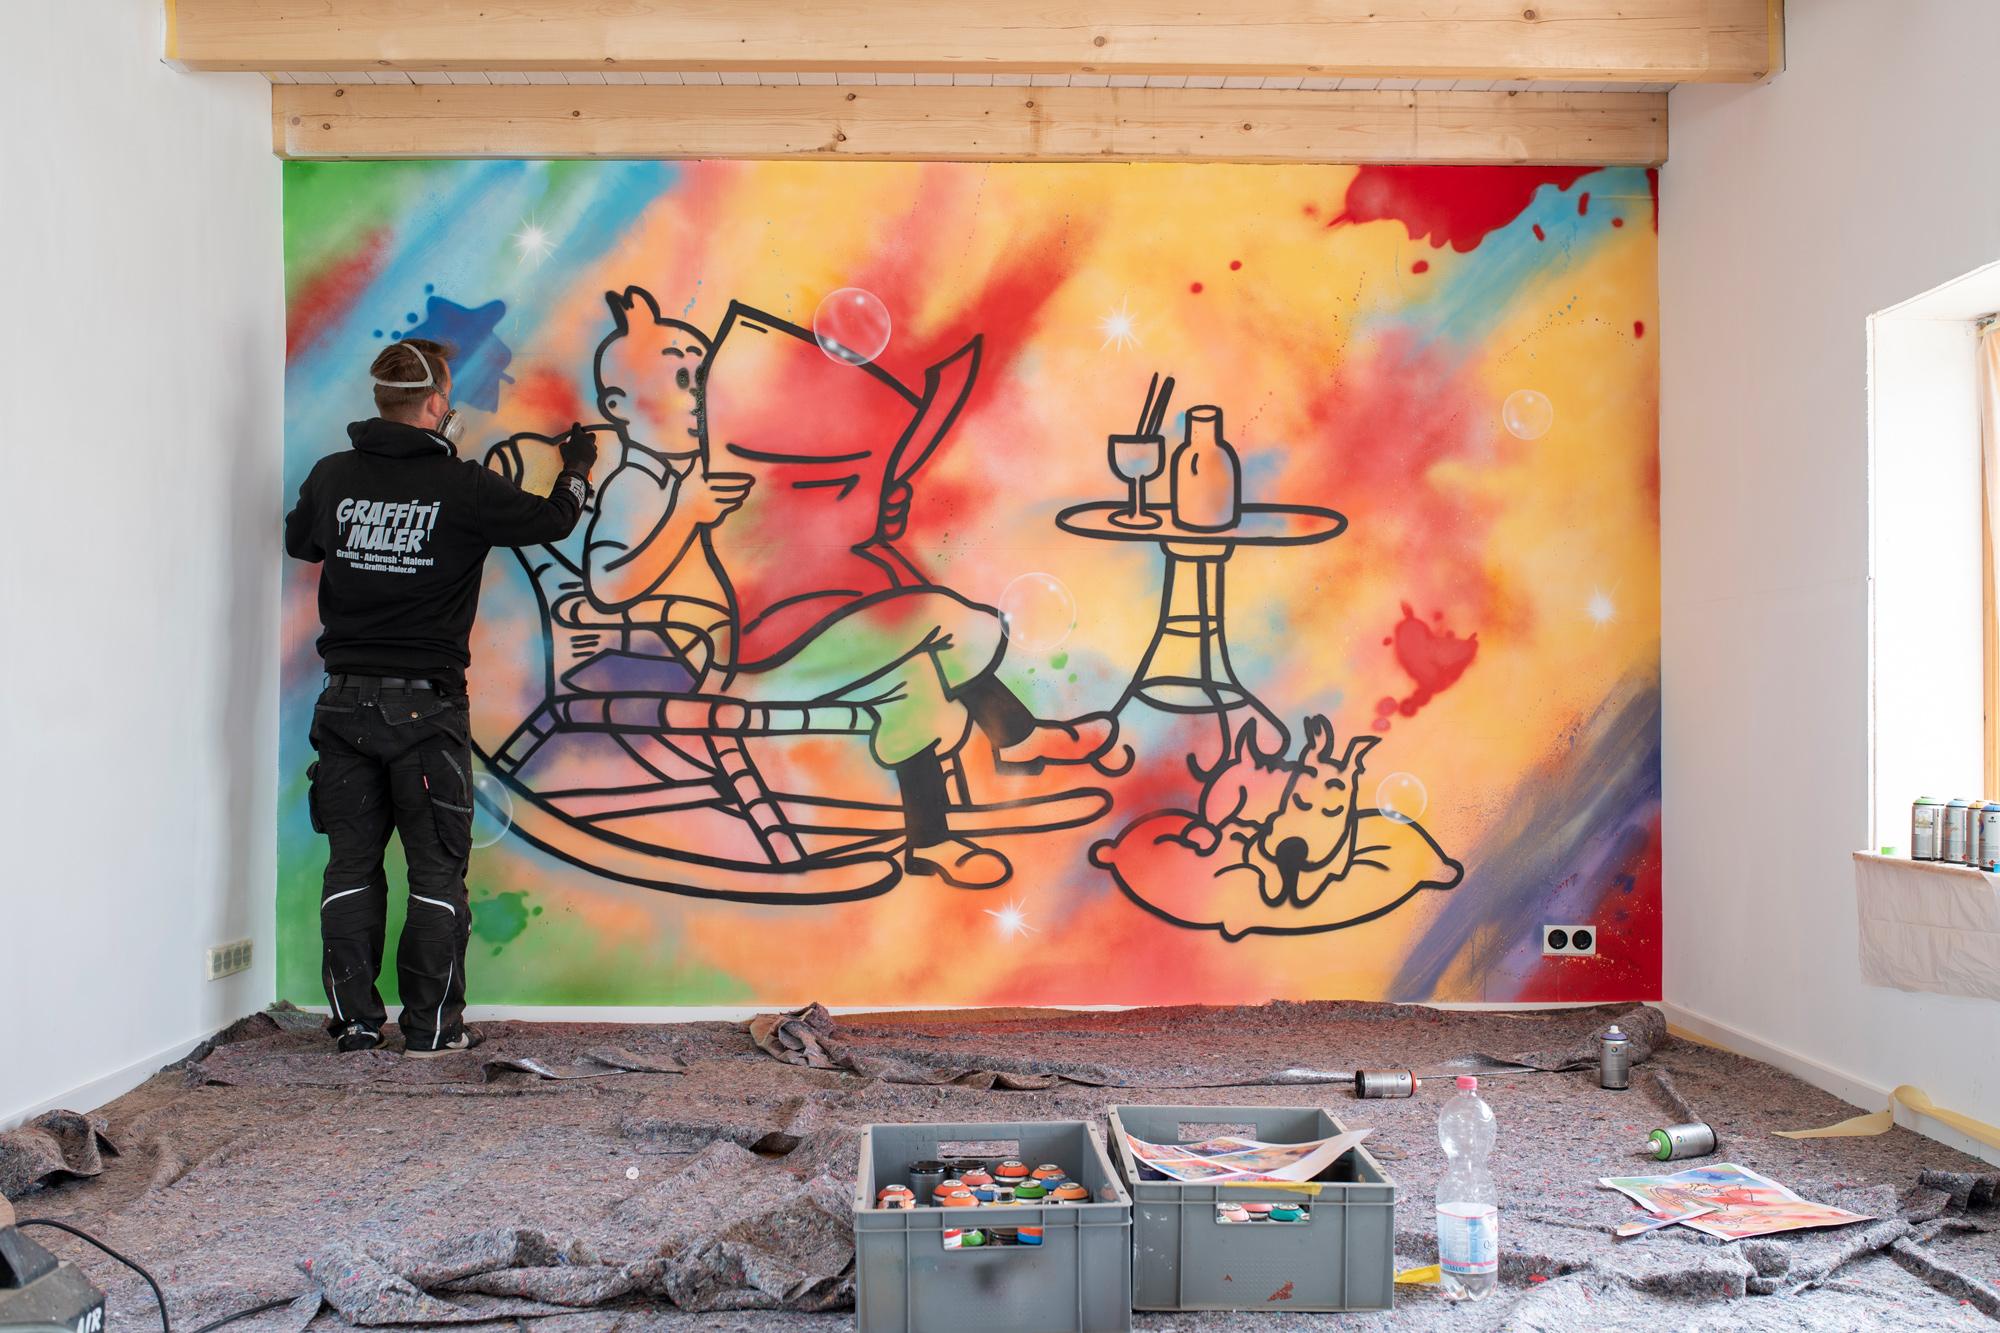 Tim und Struppi Graffiti Kunst in Hamburg